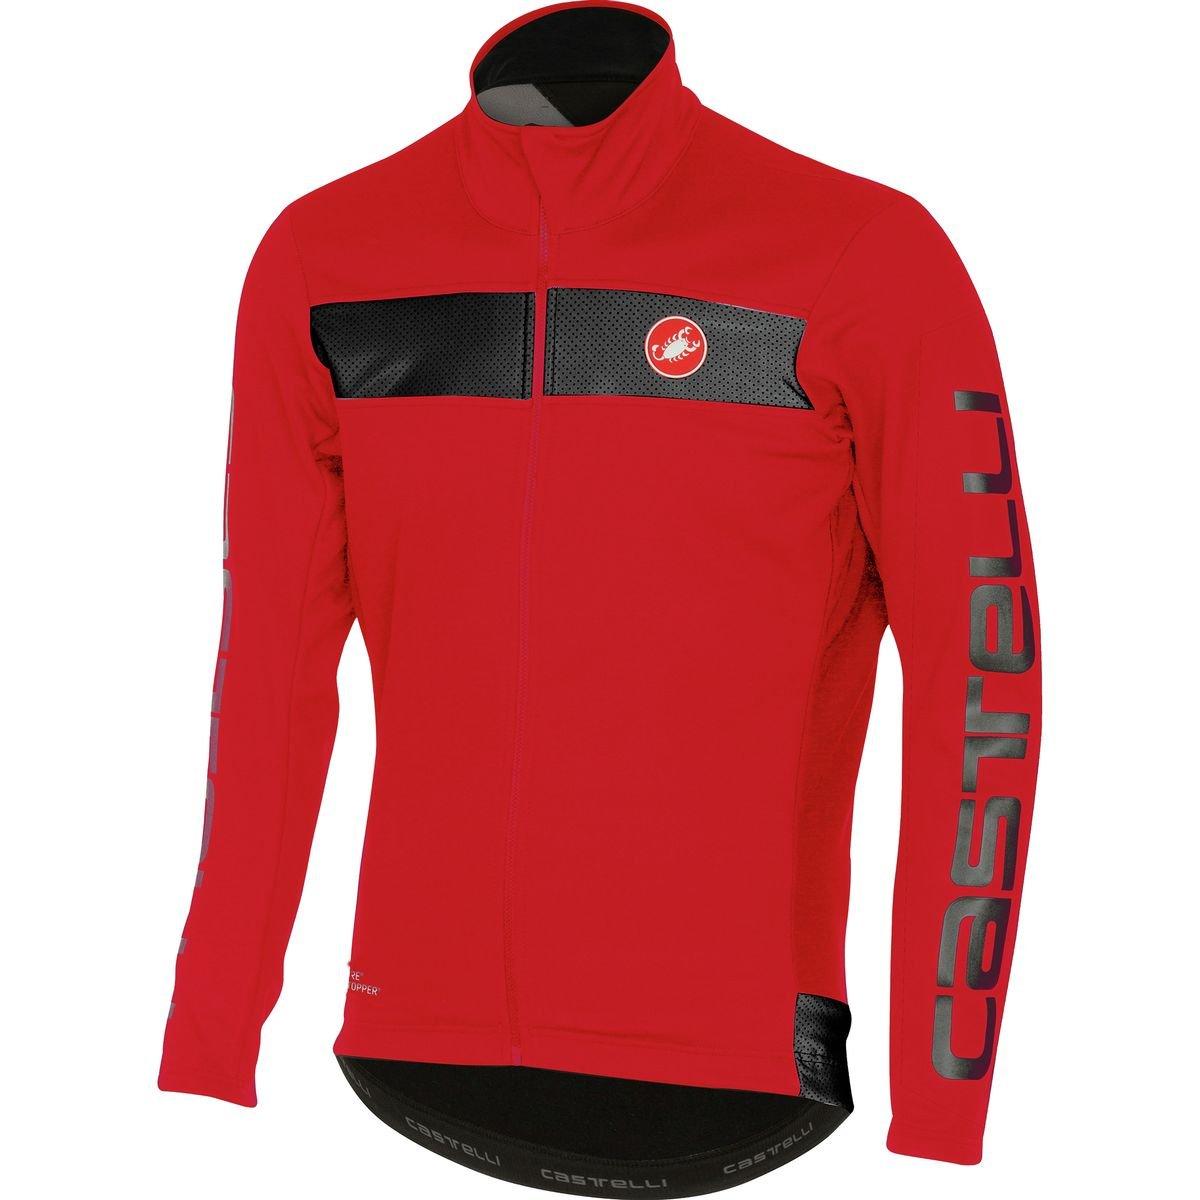 Castelli Raddoppia Jacket - Men's Red, S